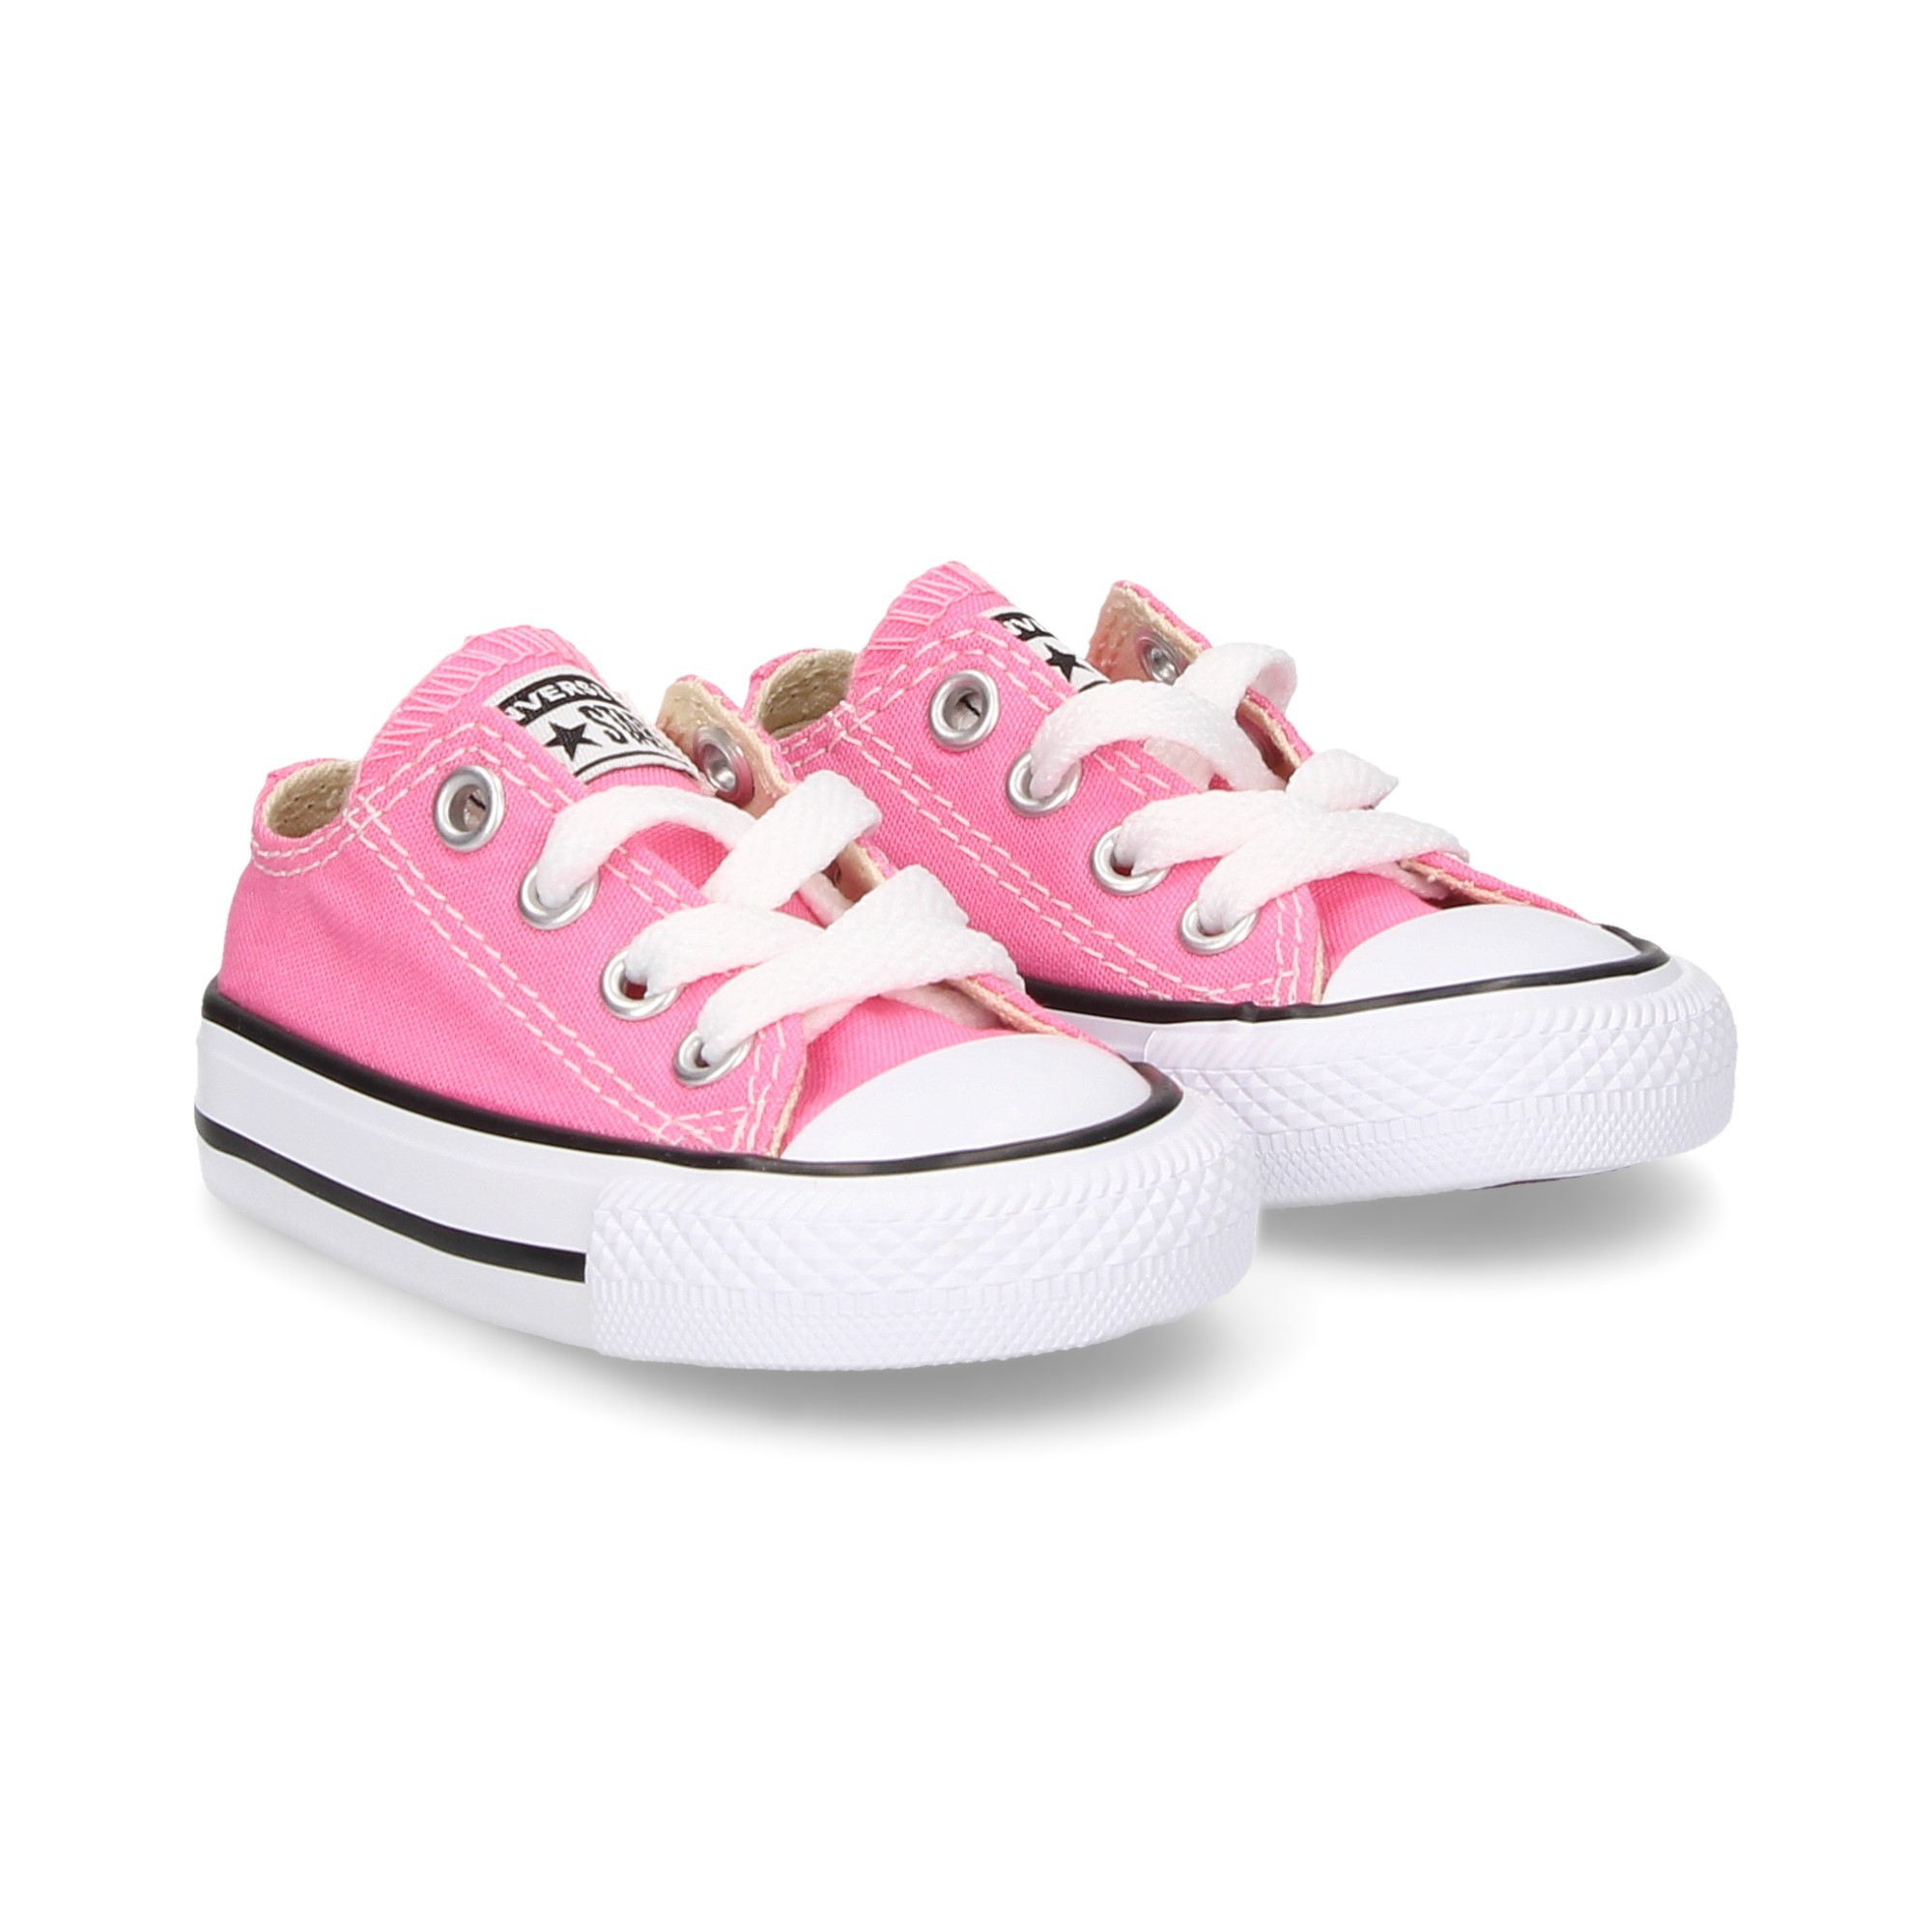 2converse niño rosa